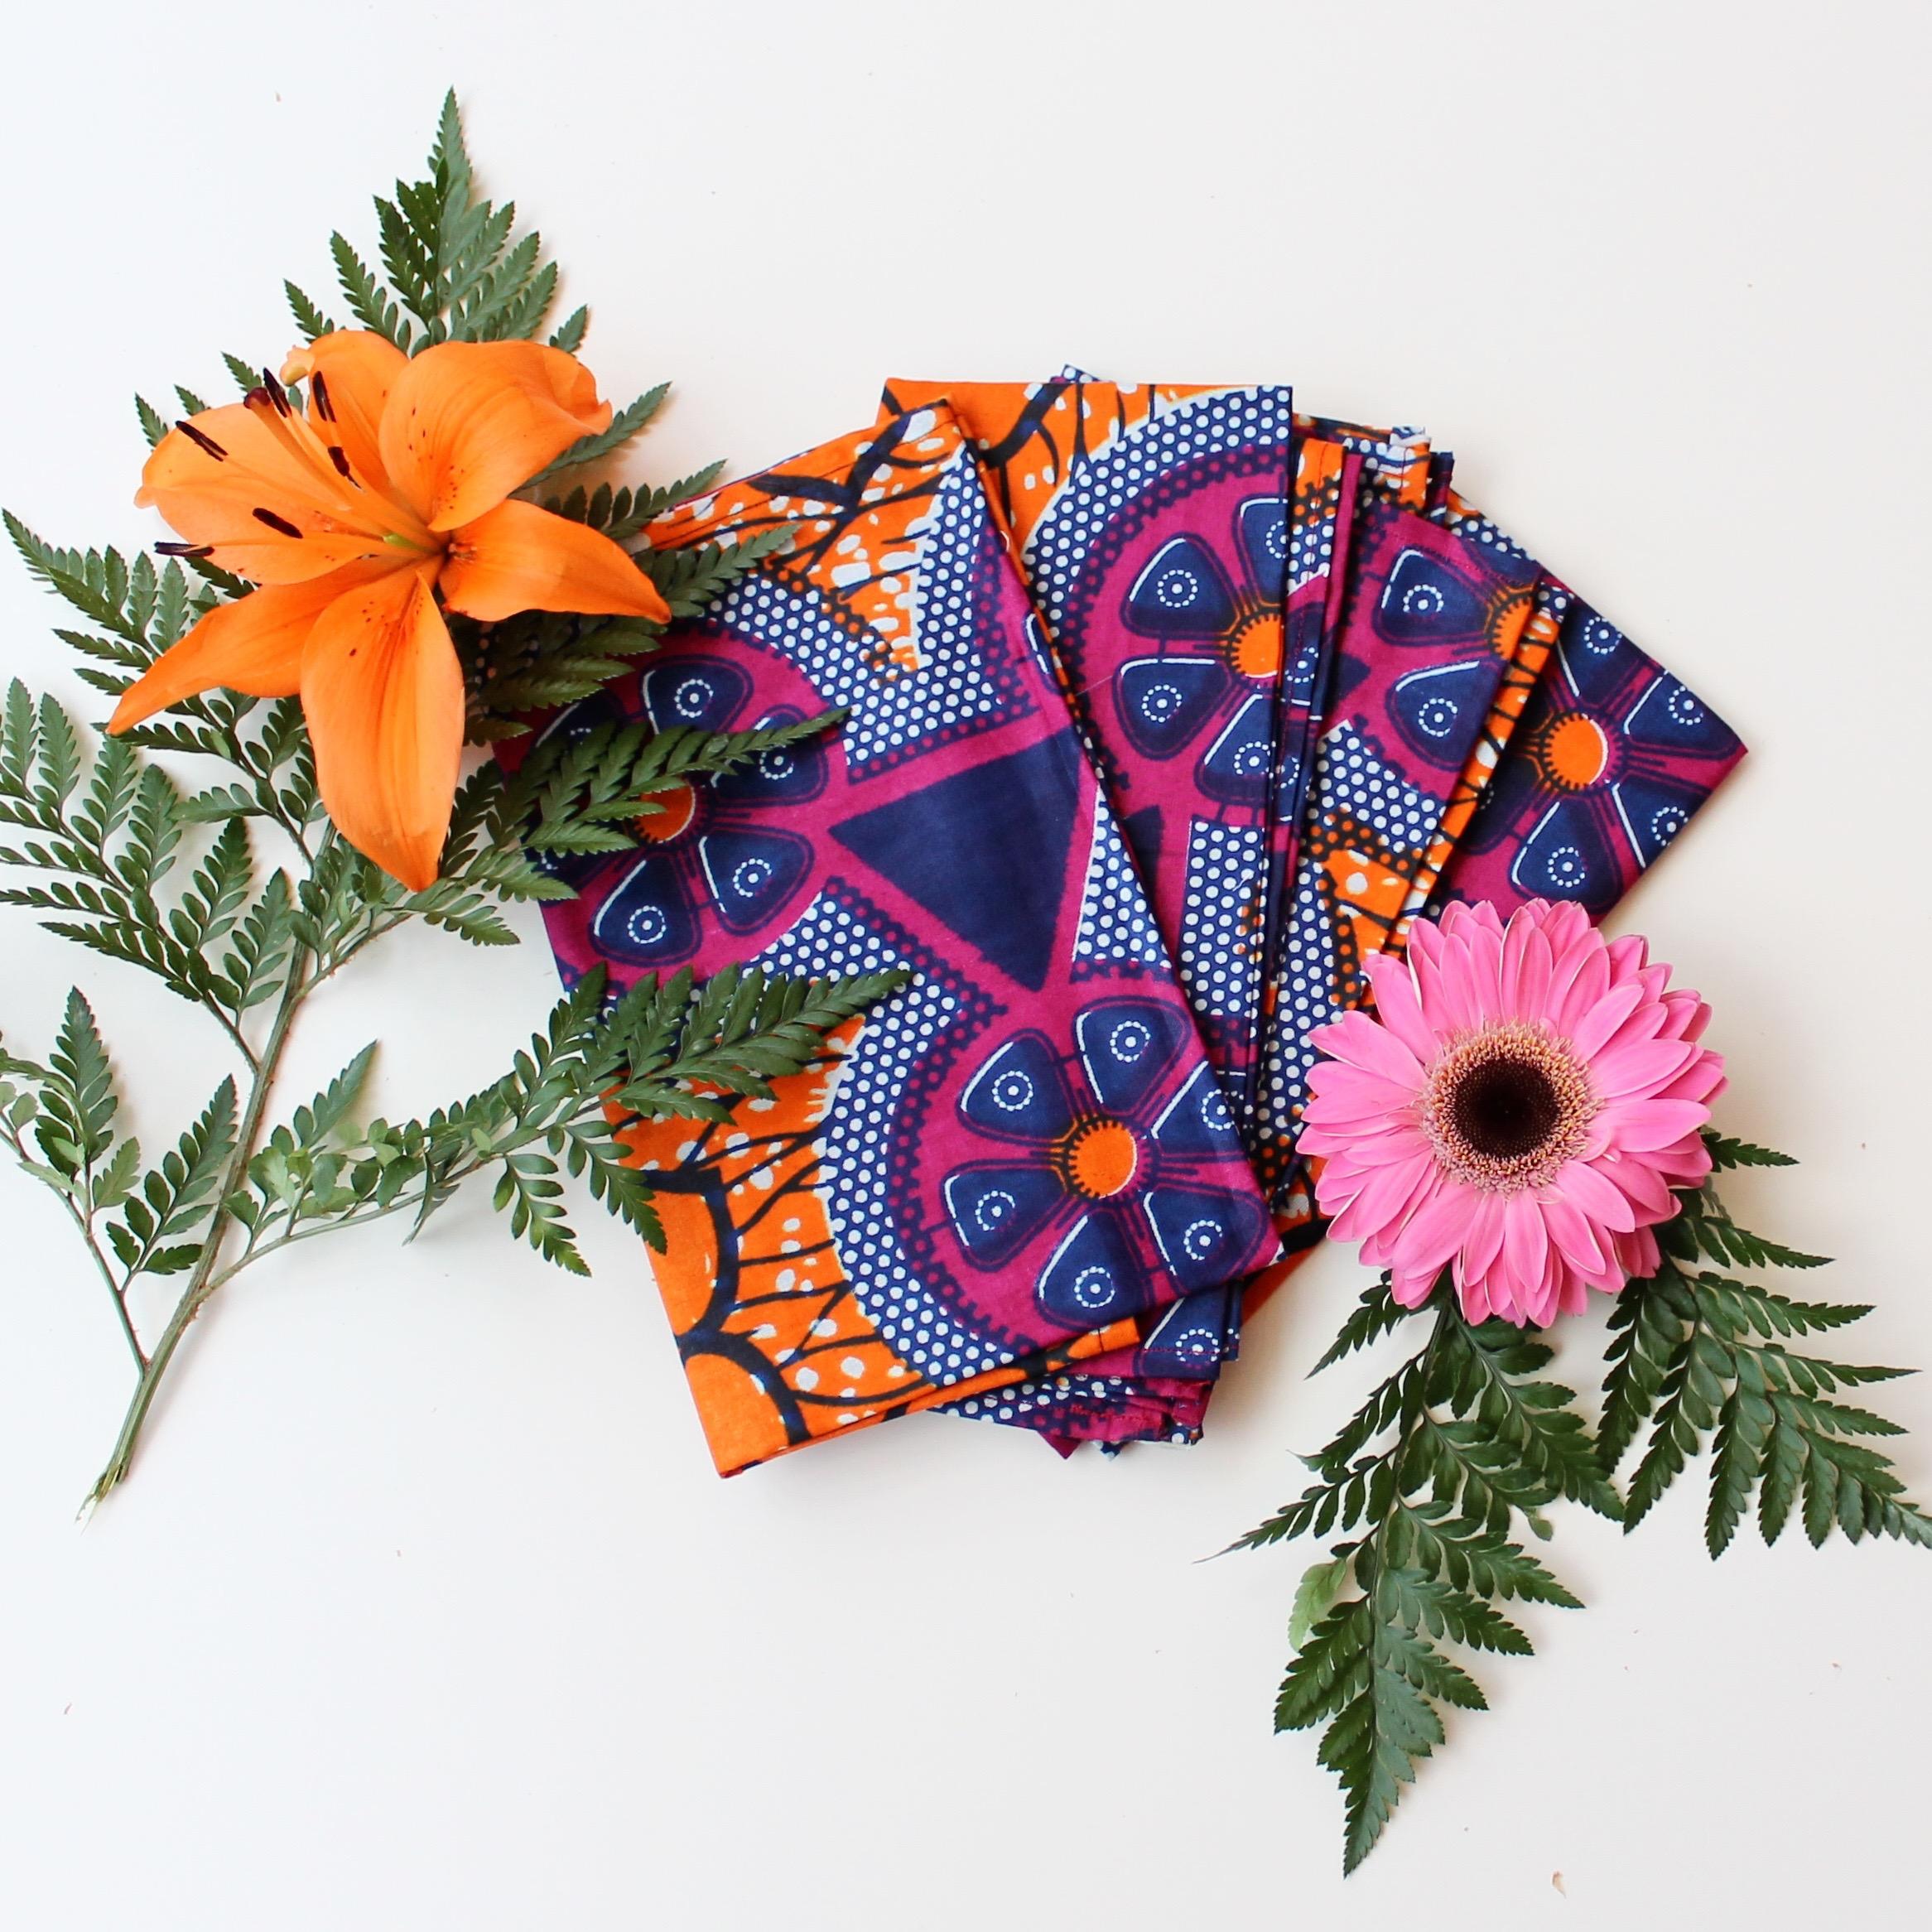 Martha Napkins in Flower Power